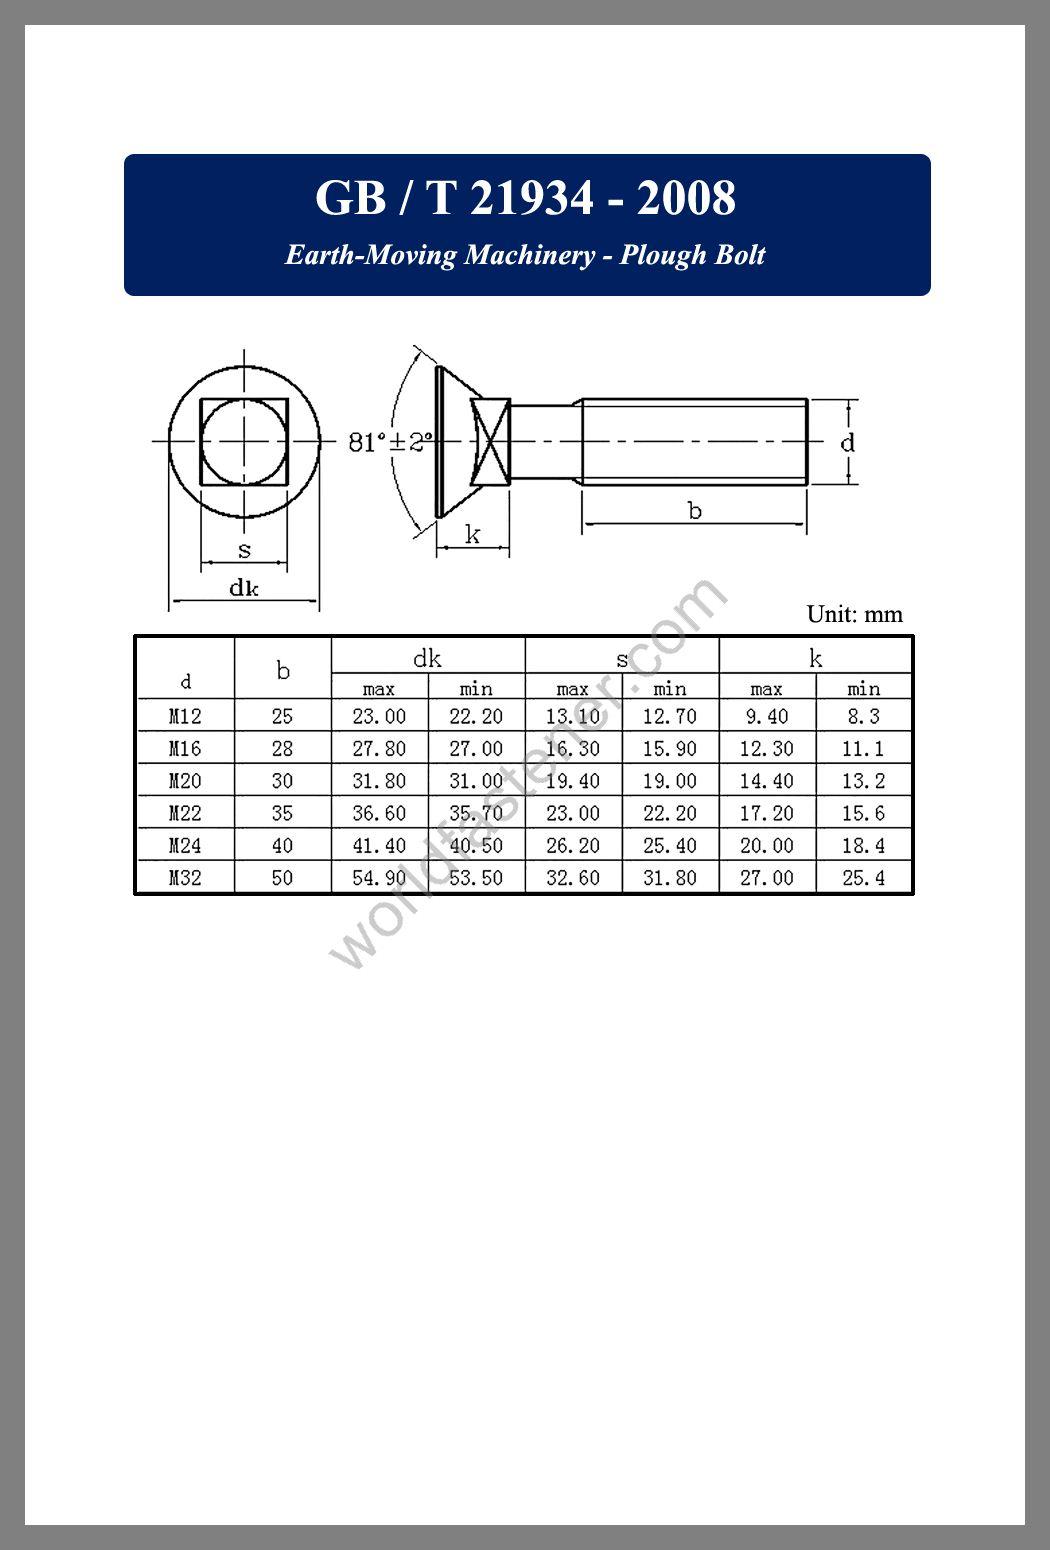 GB /T 21934 Earth-Moving Machinery - Plough Bolt, Countersunk Head Screws, fastener, screw, bolt, GB bolts, GB Fasteners